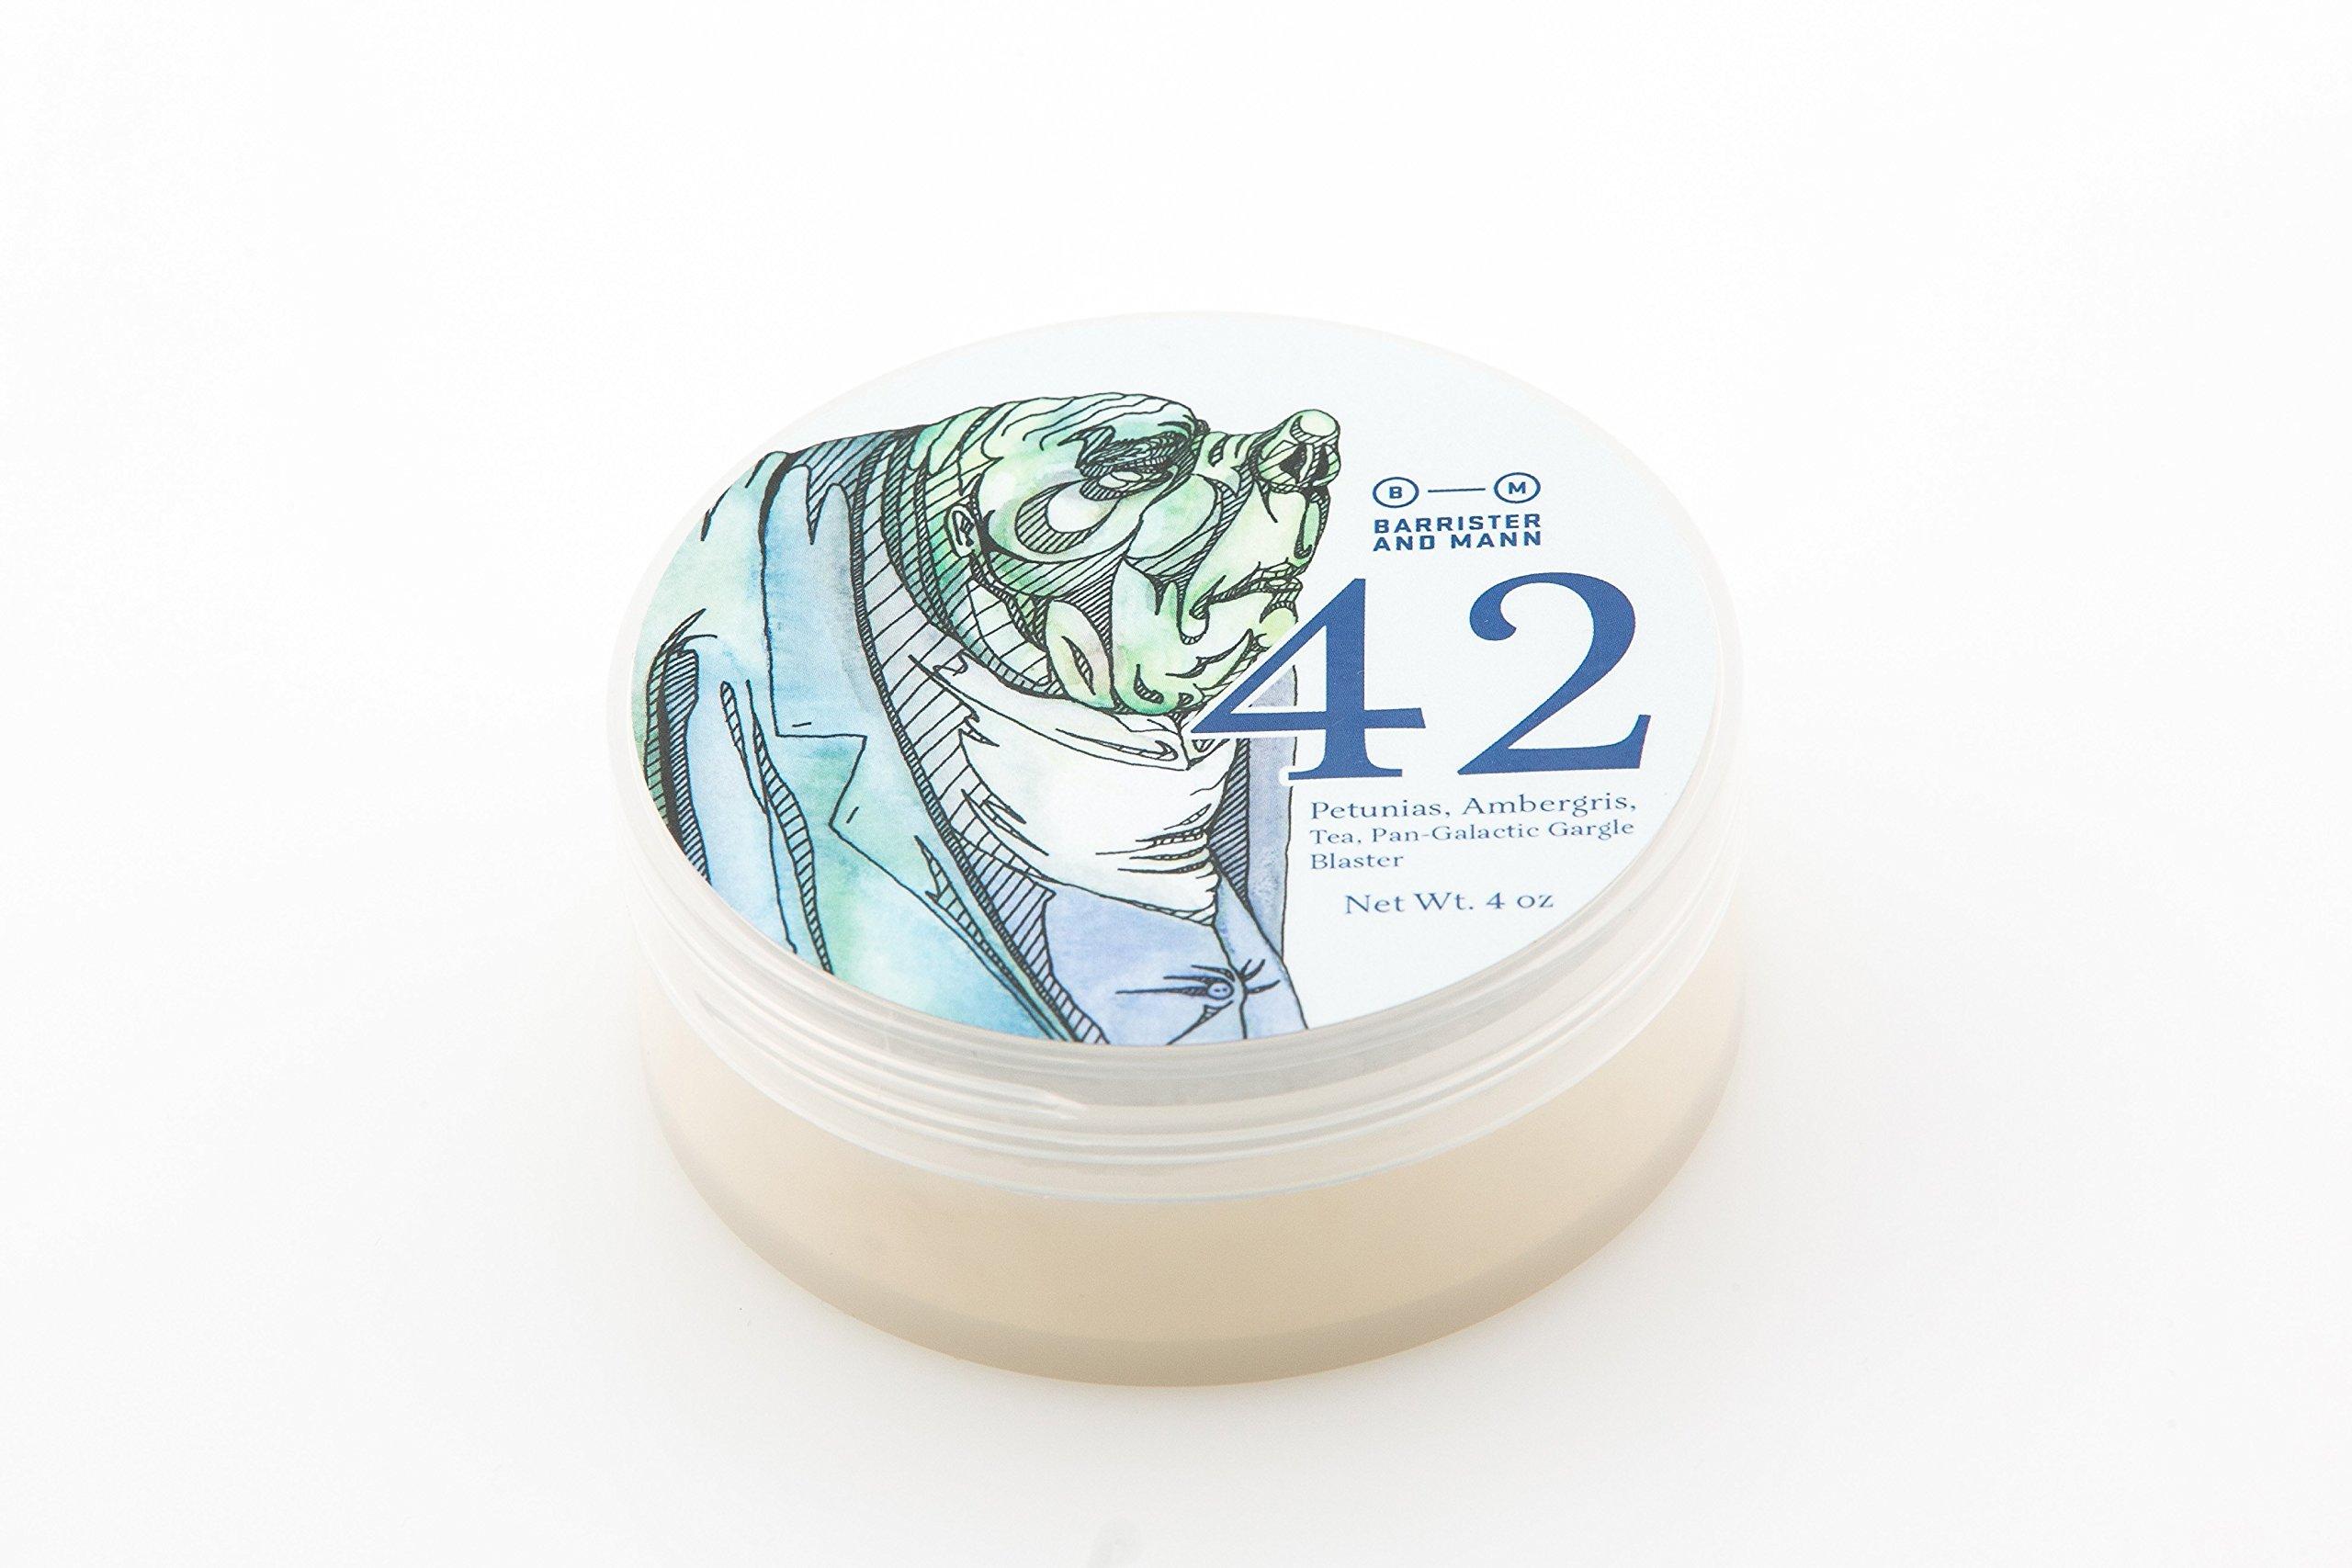 Barrister and Mann Shaving Soap (42)